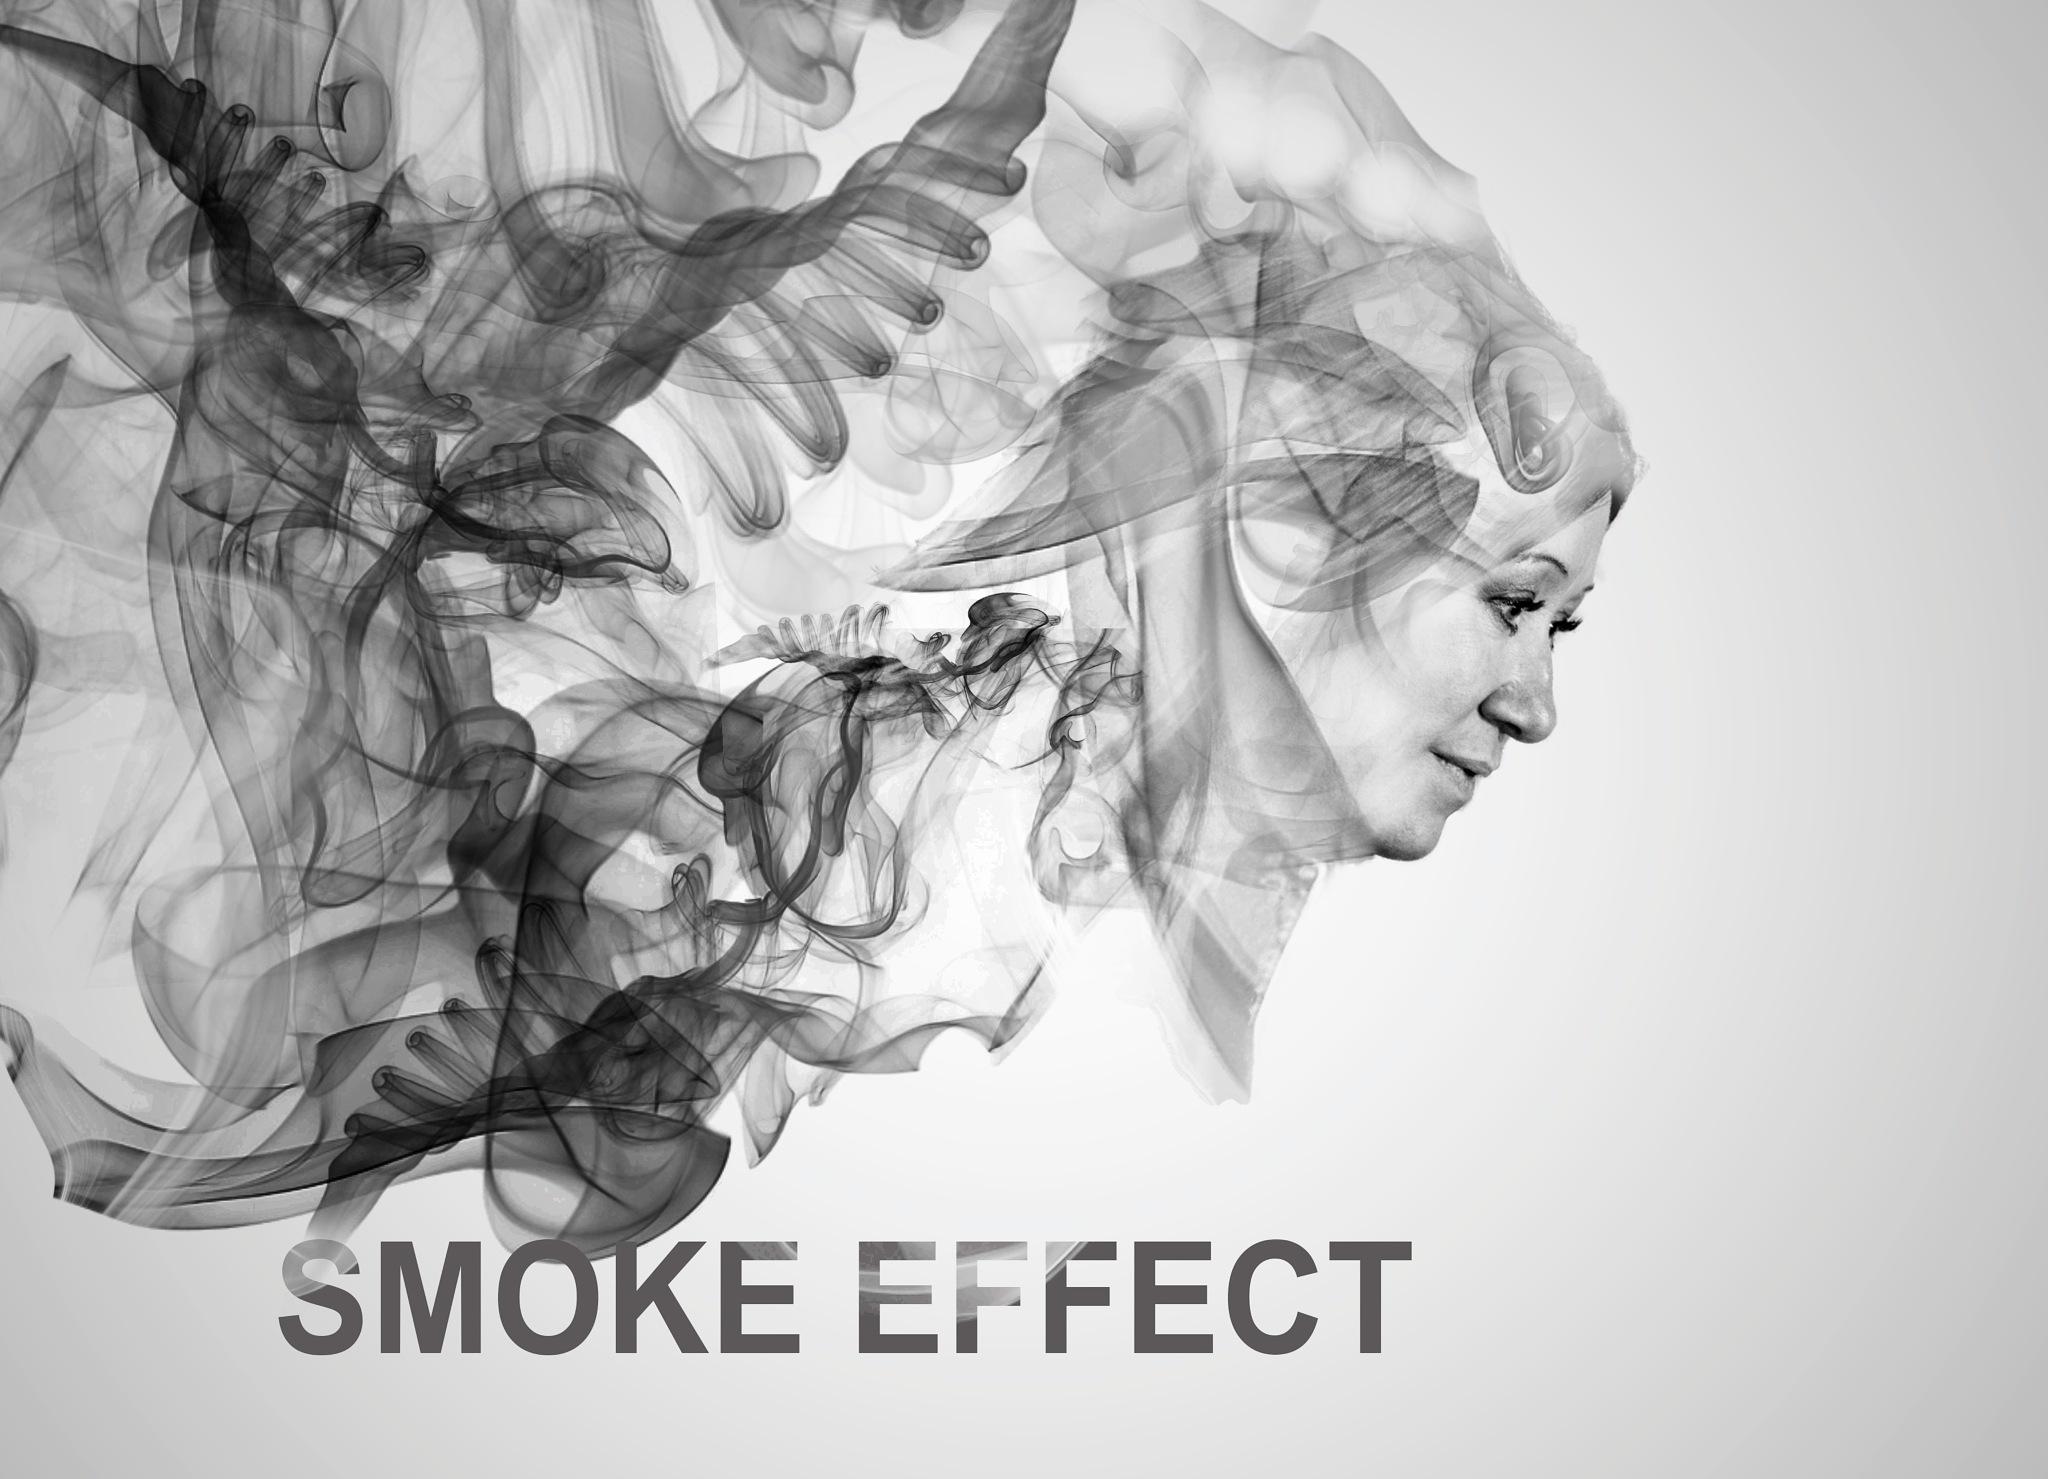 Smoke Effect by Gary Bibby